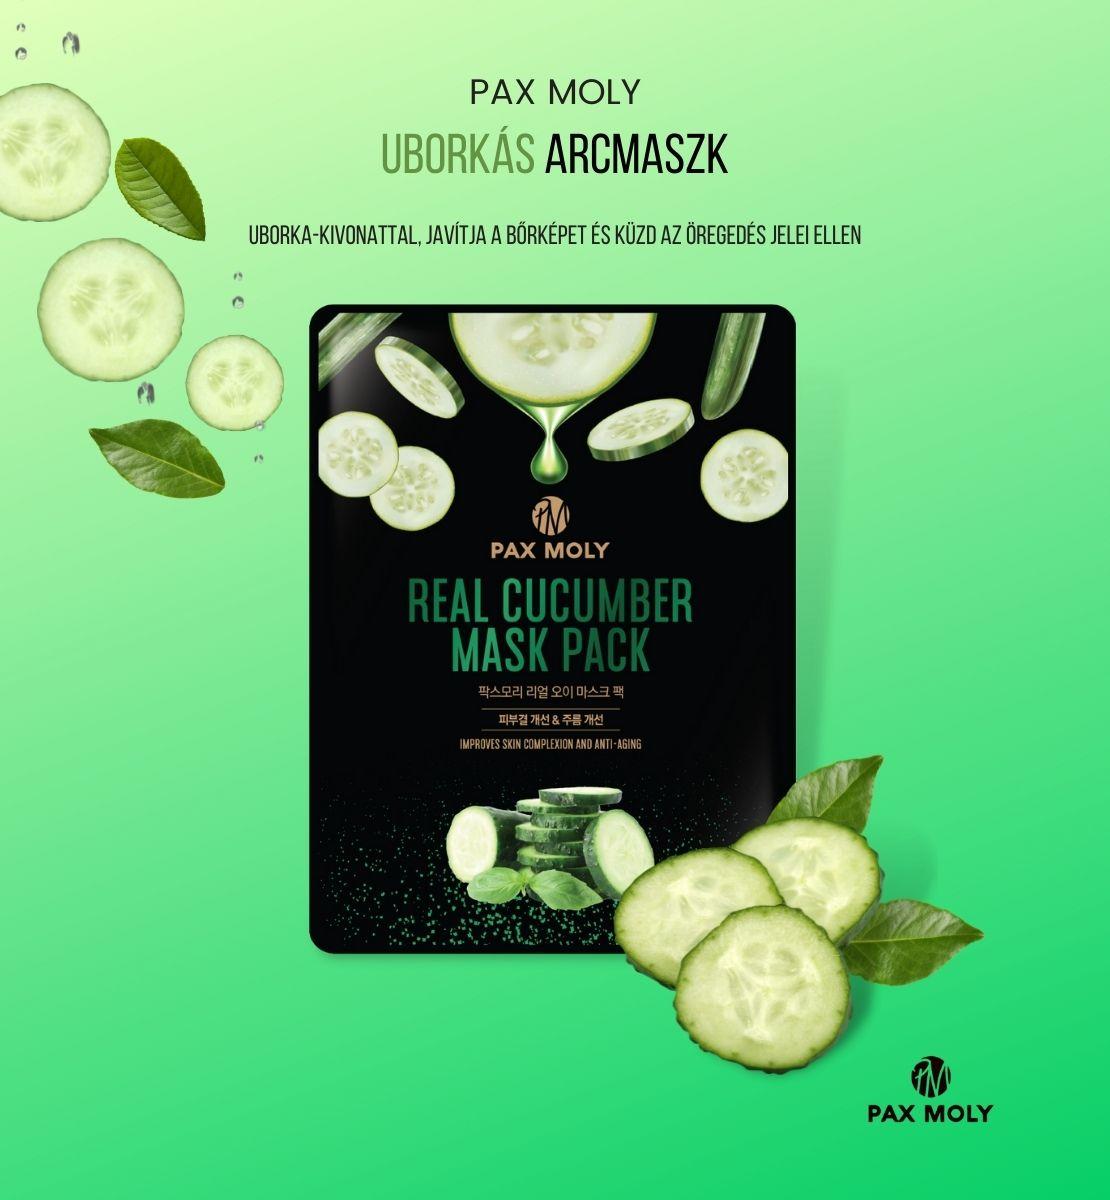 paxmoly-real-cucumber-uborkas-arcmaszk